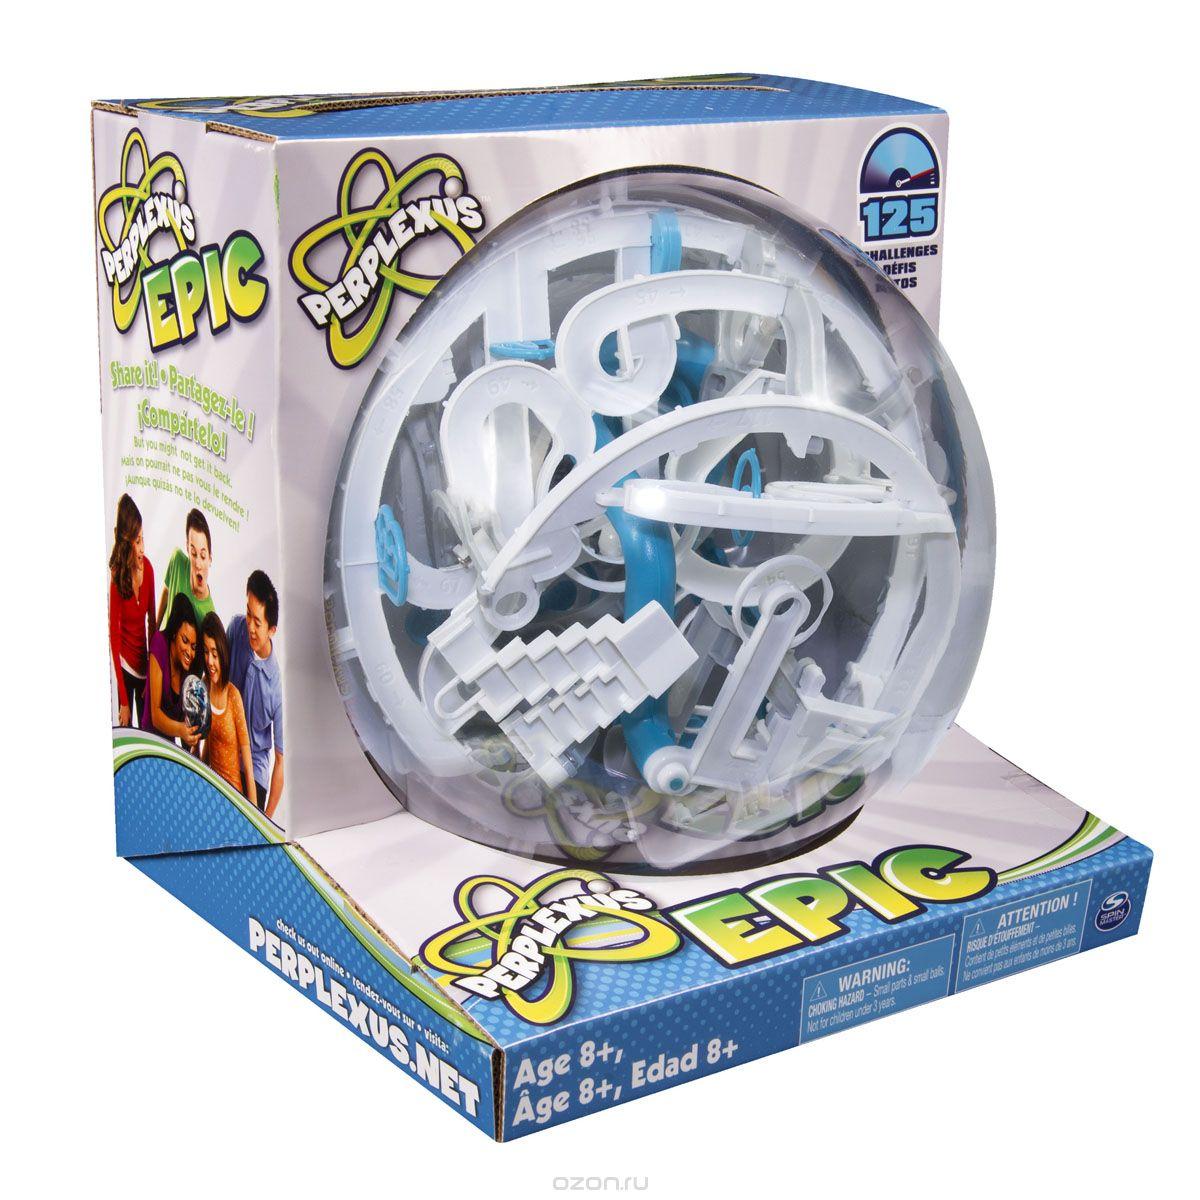 34177 Игра Spin Master головоломка Perplexus Epic, 125 барьеров